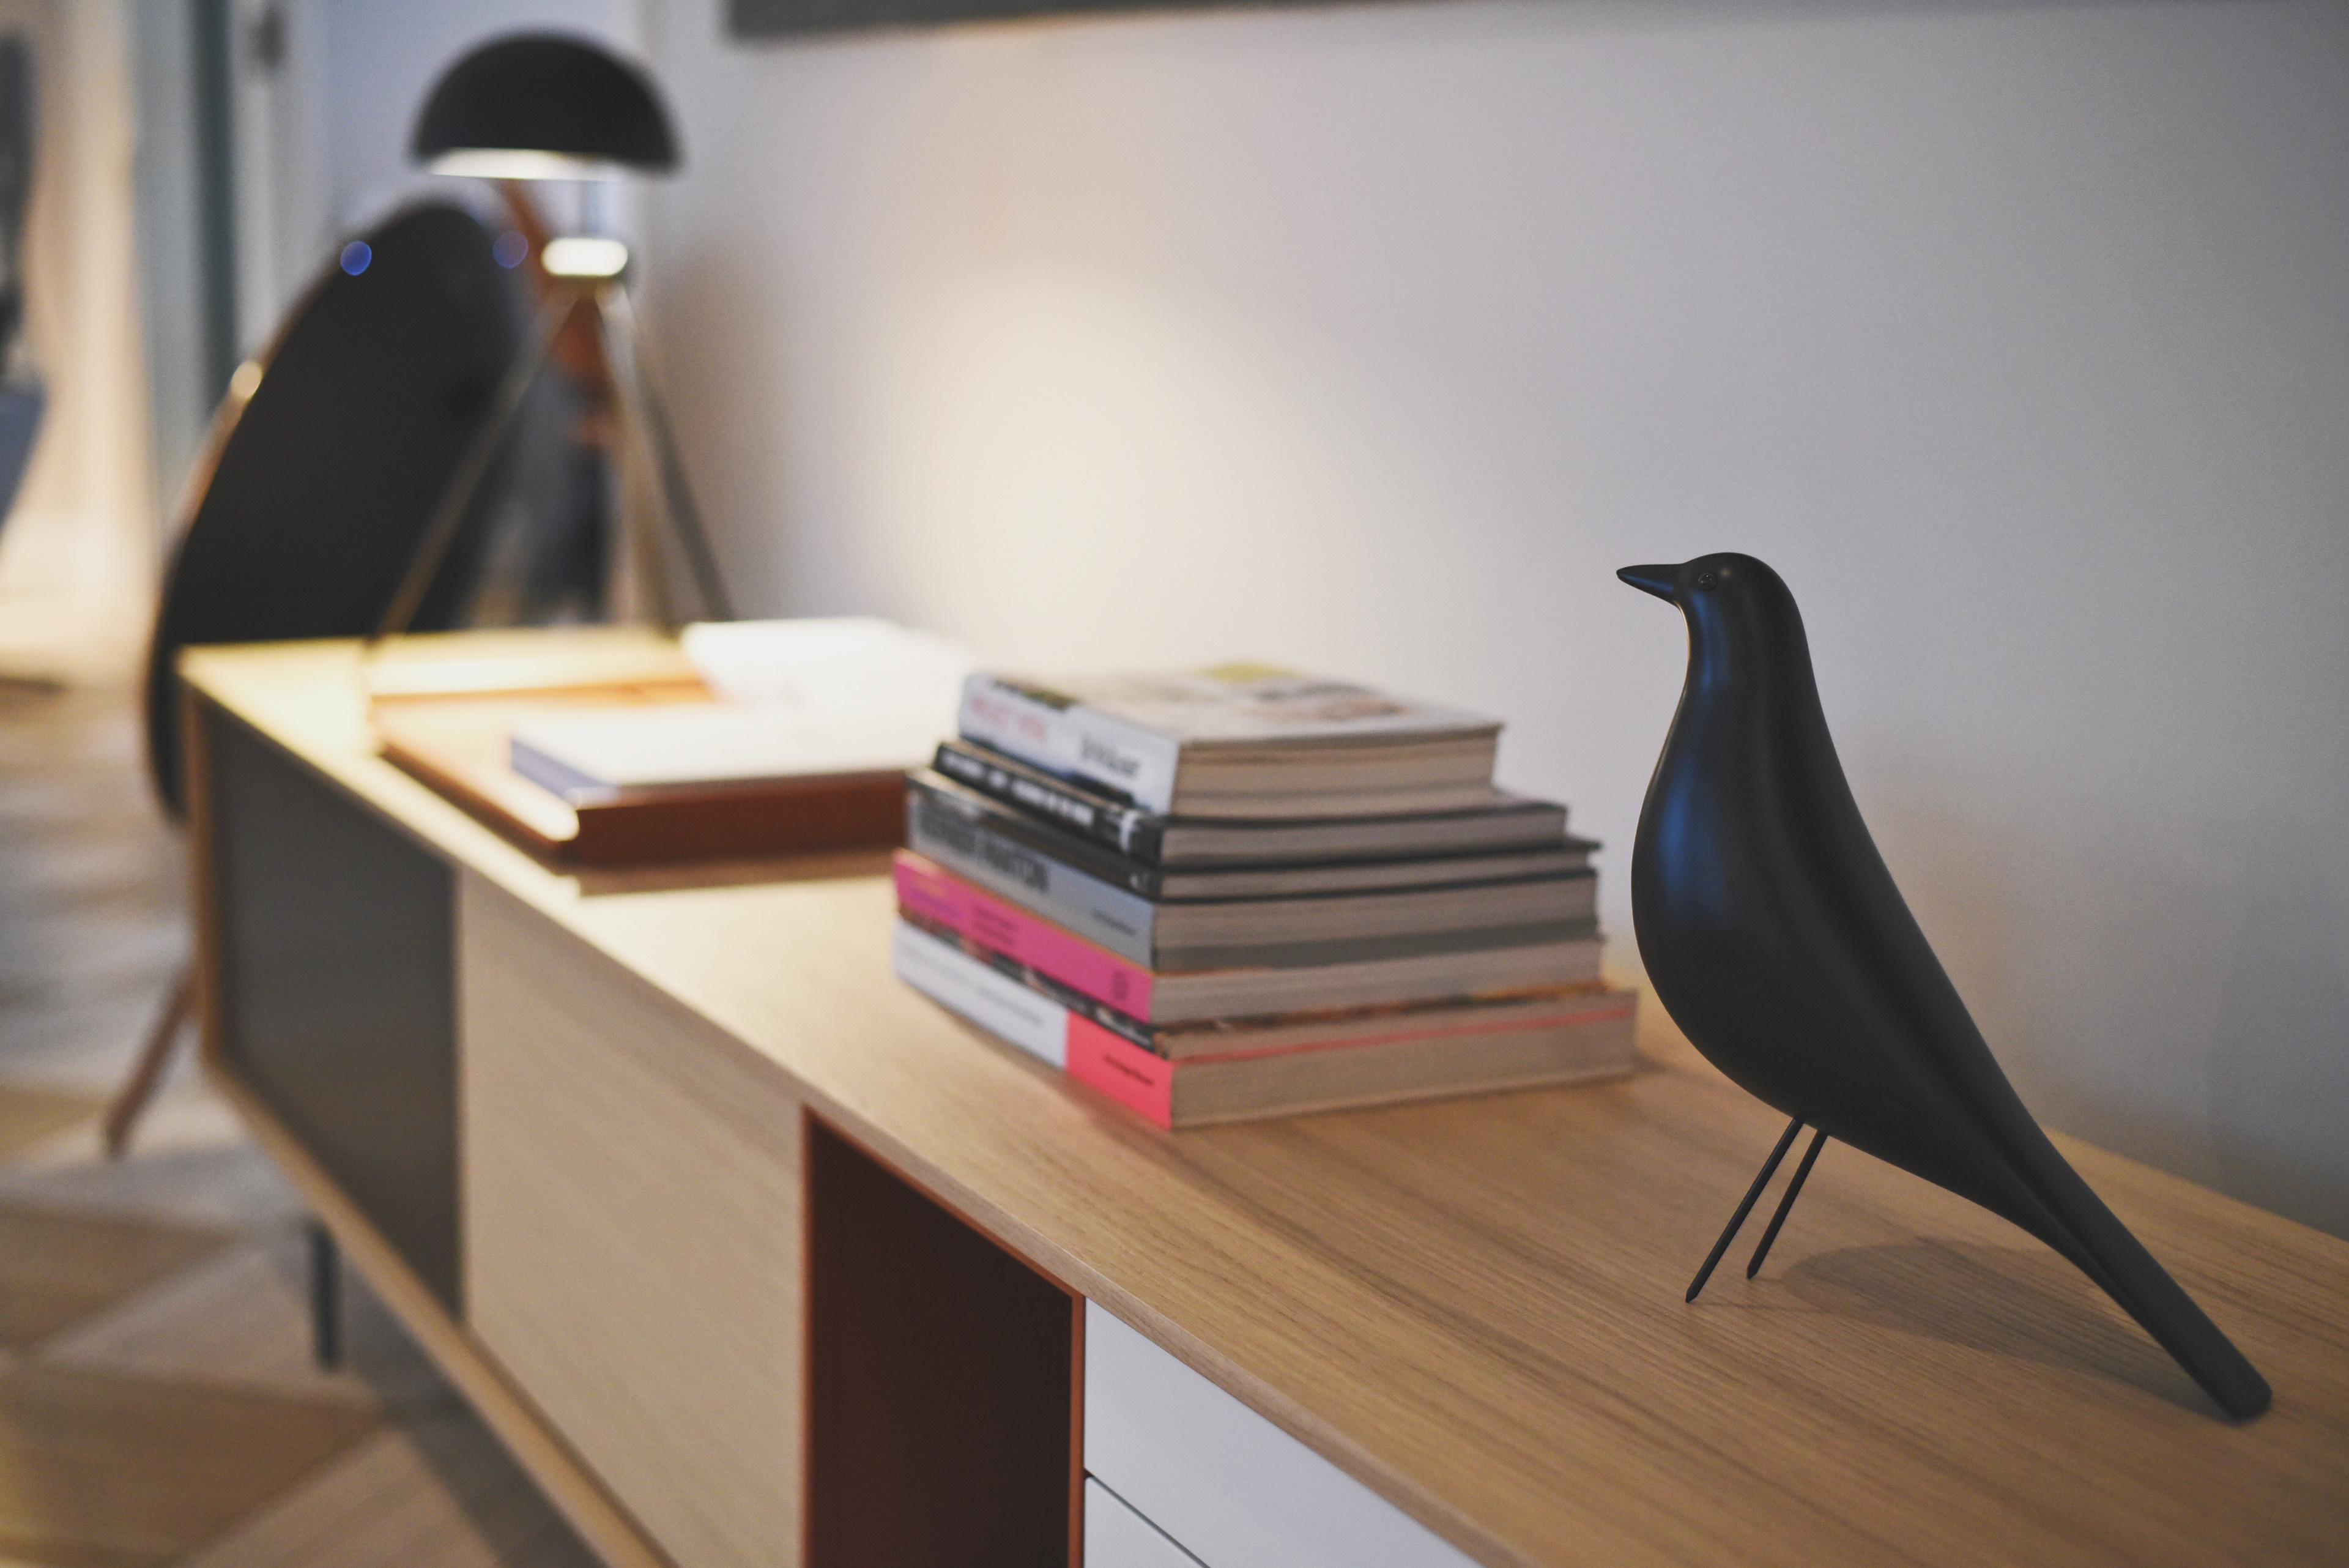 j drzej franek objects vitra eames house bird. Black Bedroom Furniture Sets. Home Design Ideas